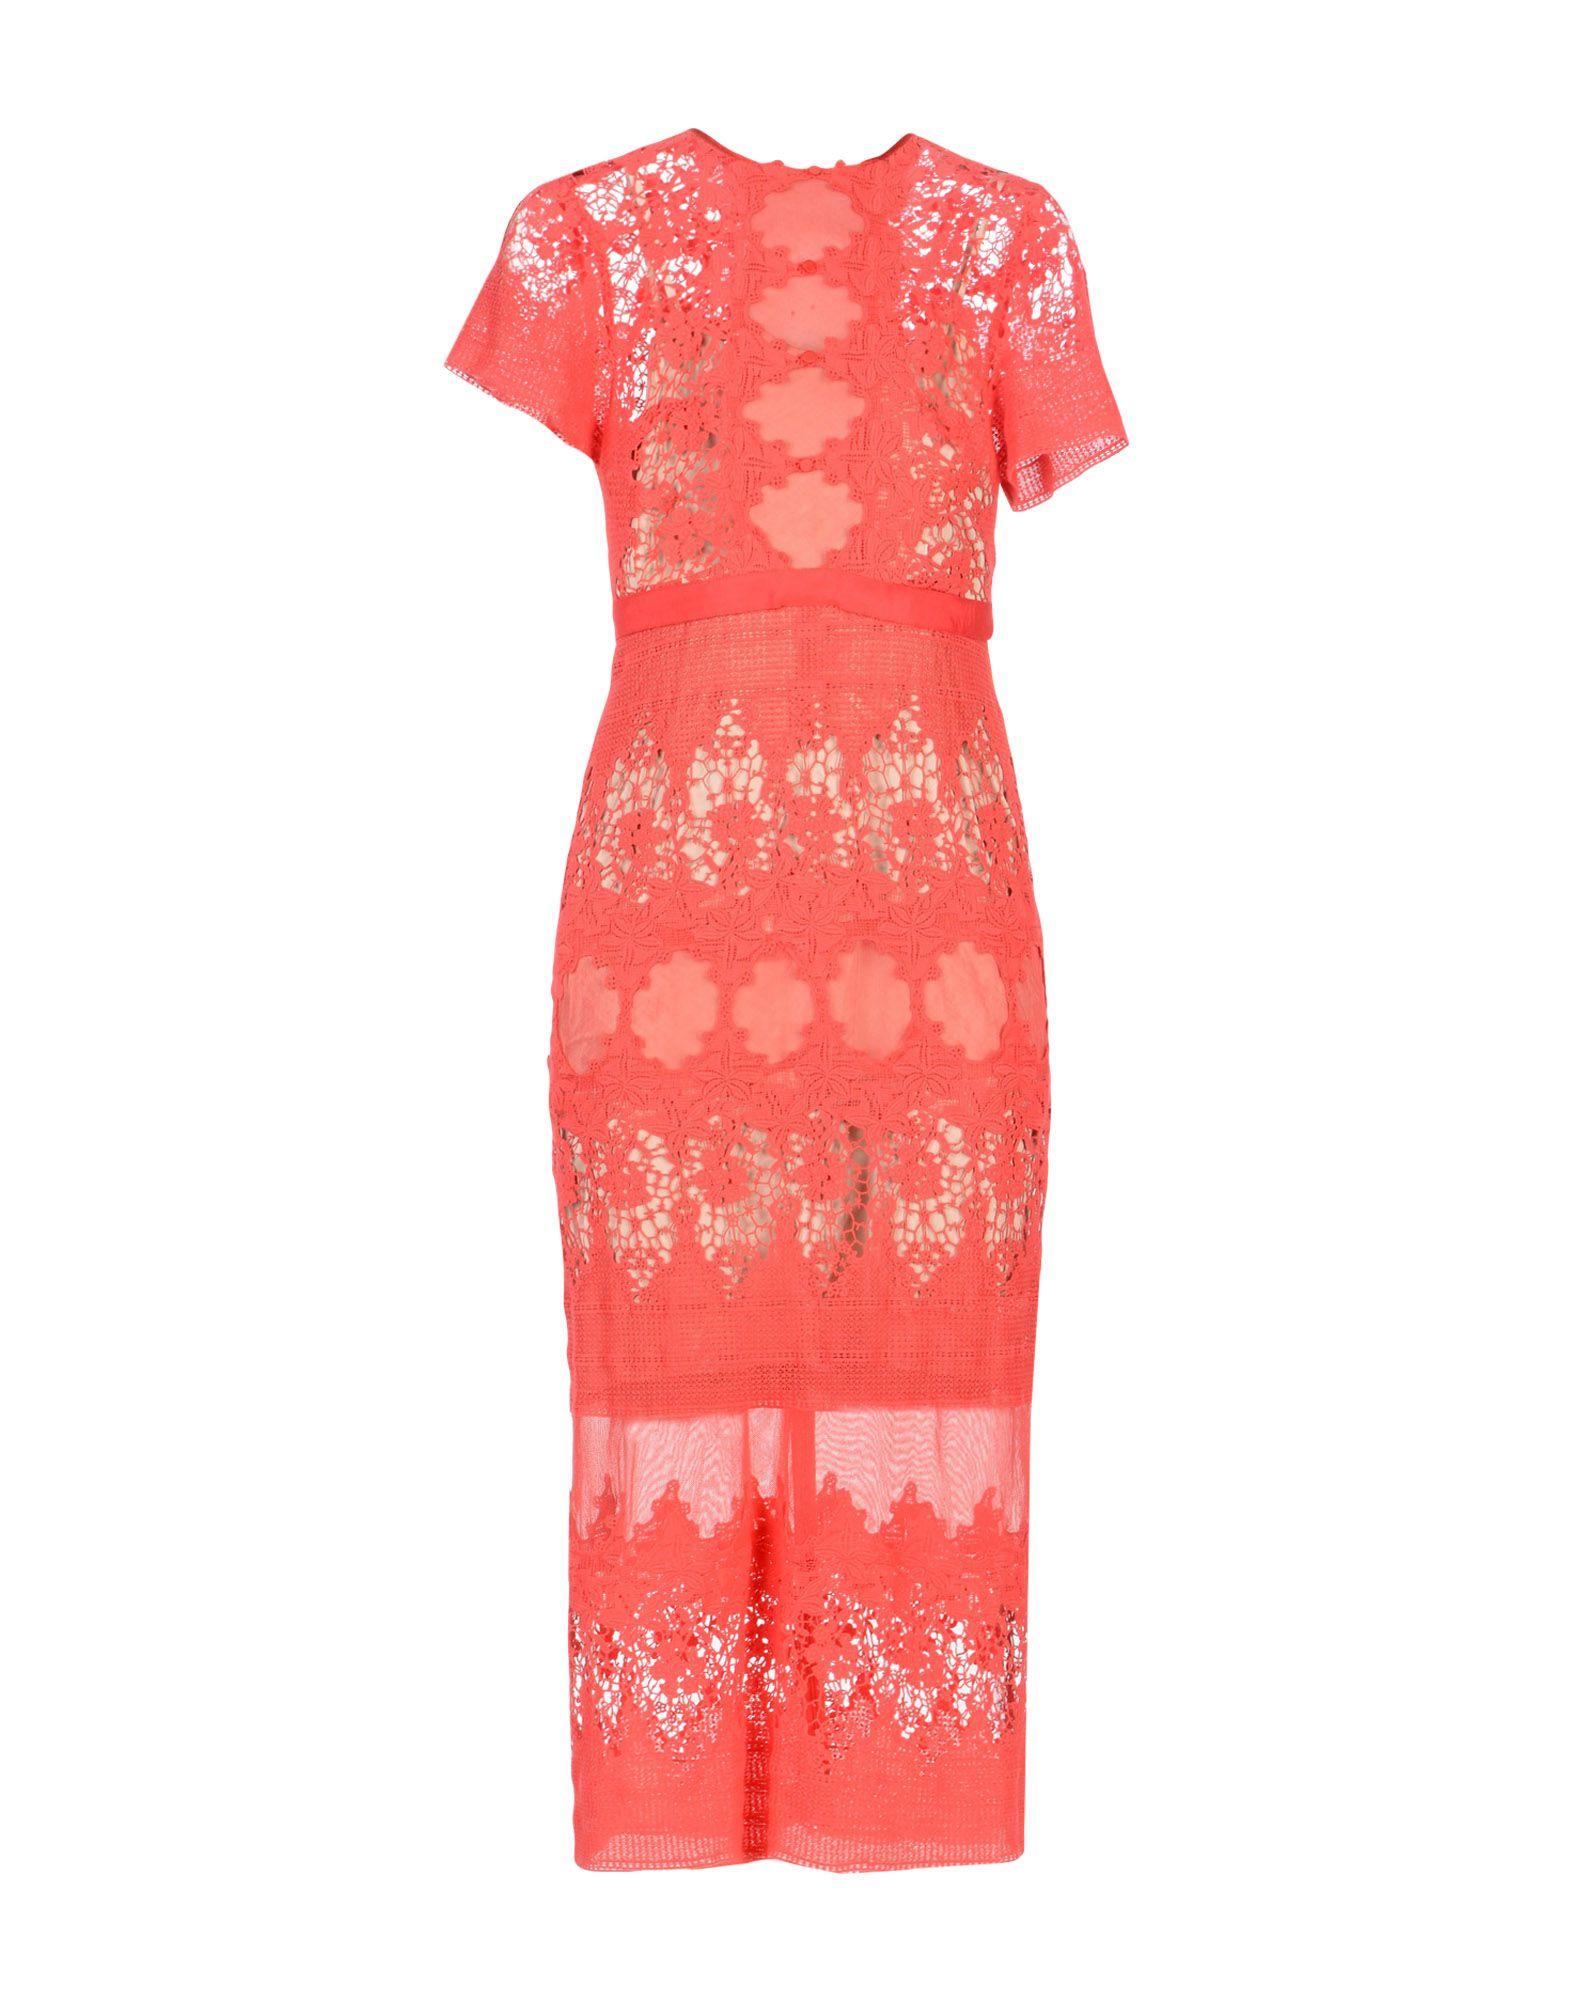 CATHERINE DEANE Платье длиной 3/4